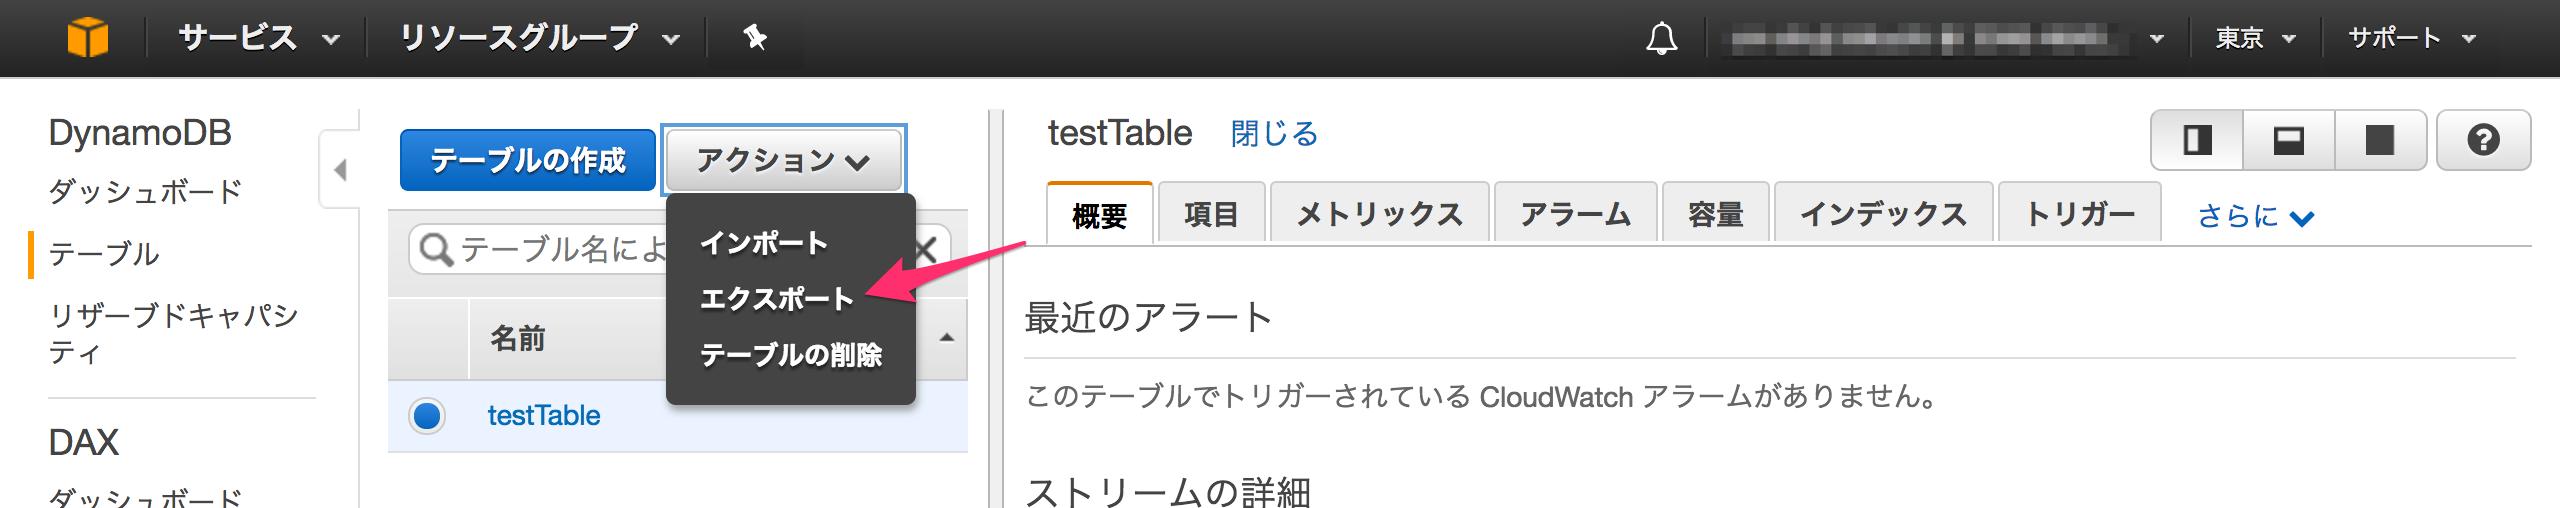 DynamoDB のテーブルを Data Pipeline でエクスポートする